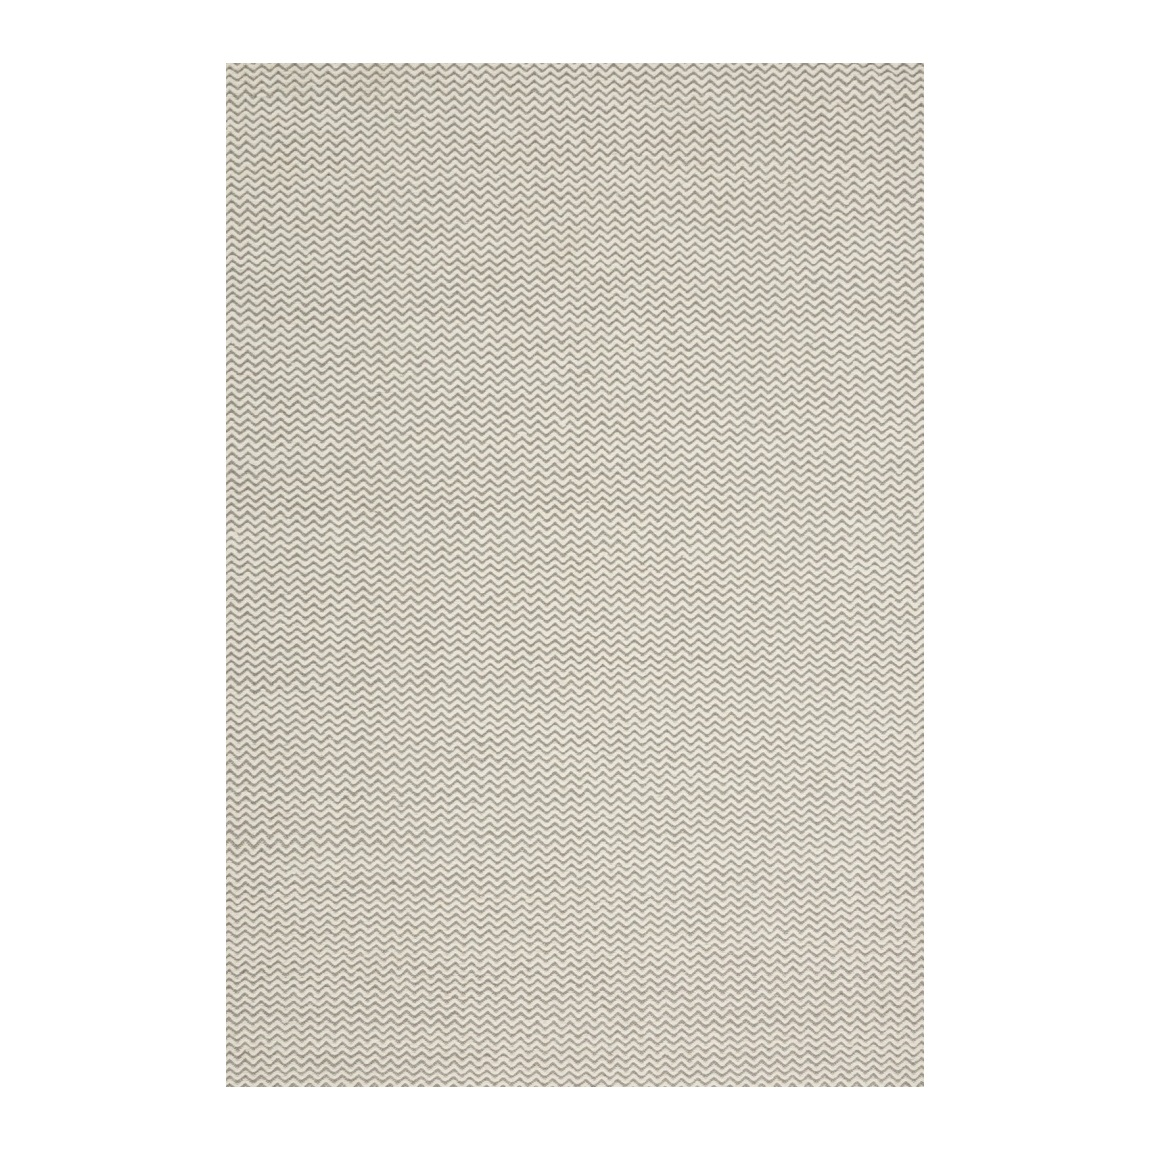 Ullmatta CORSA 200 x 300 cm Ljusgrå, Linie Design